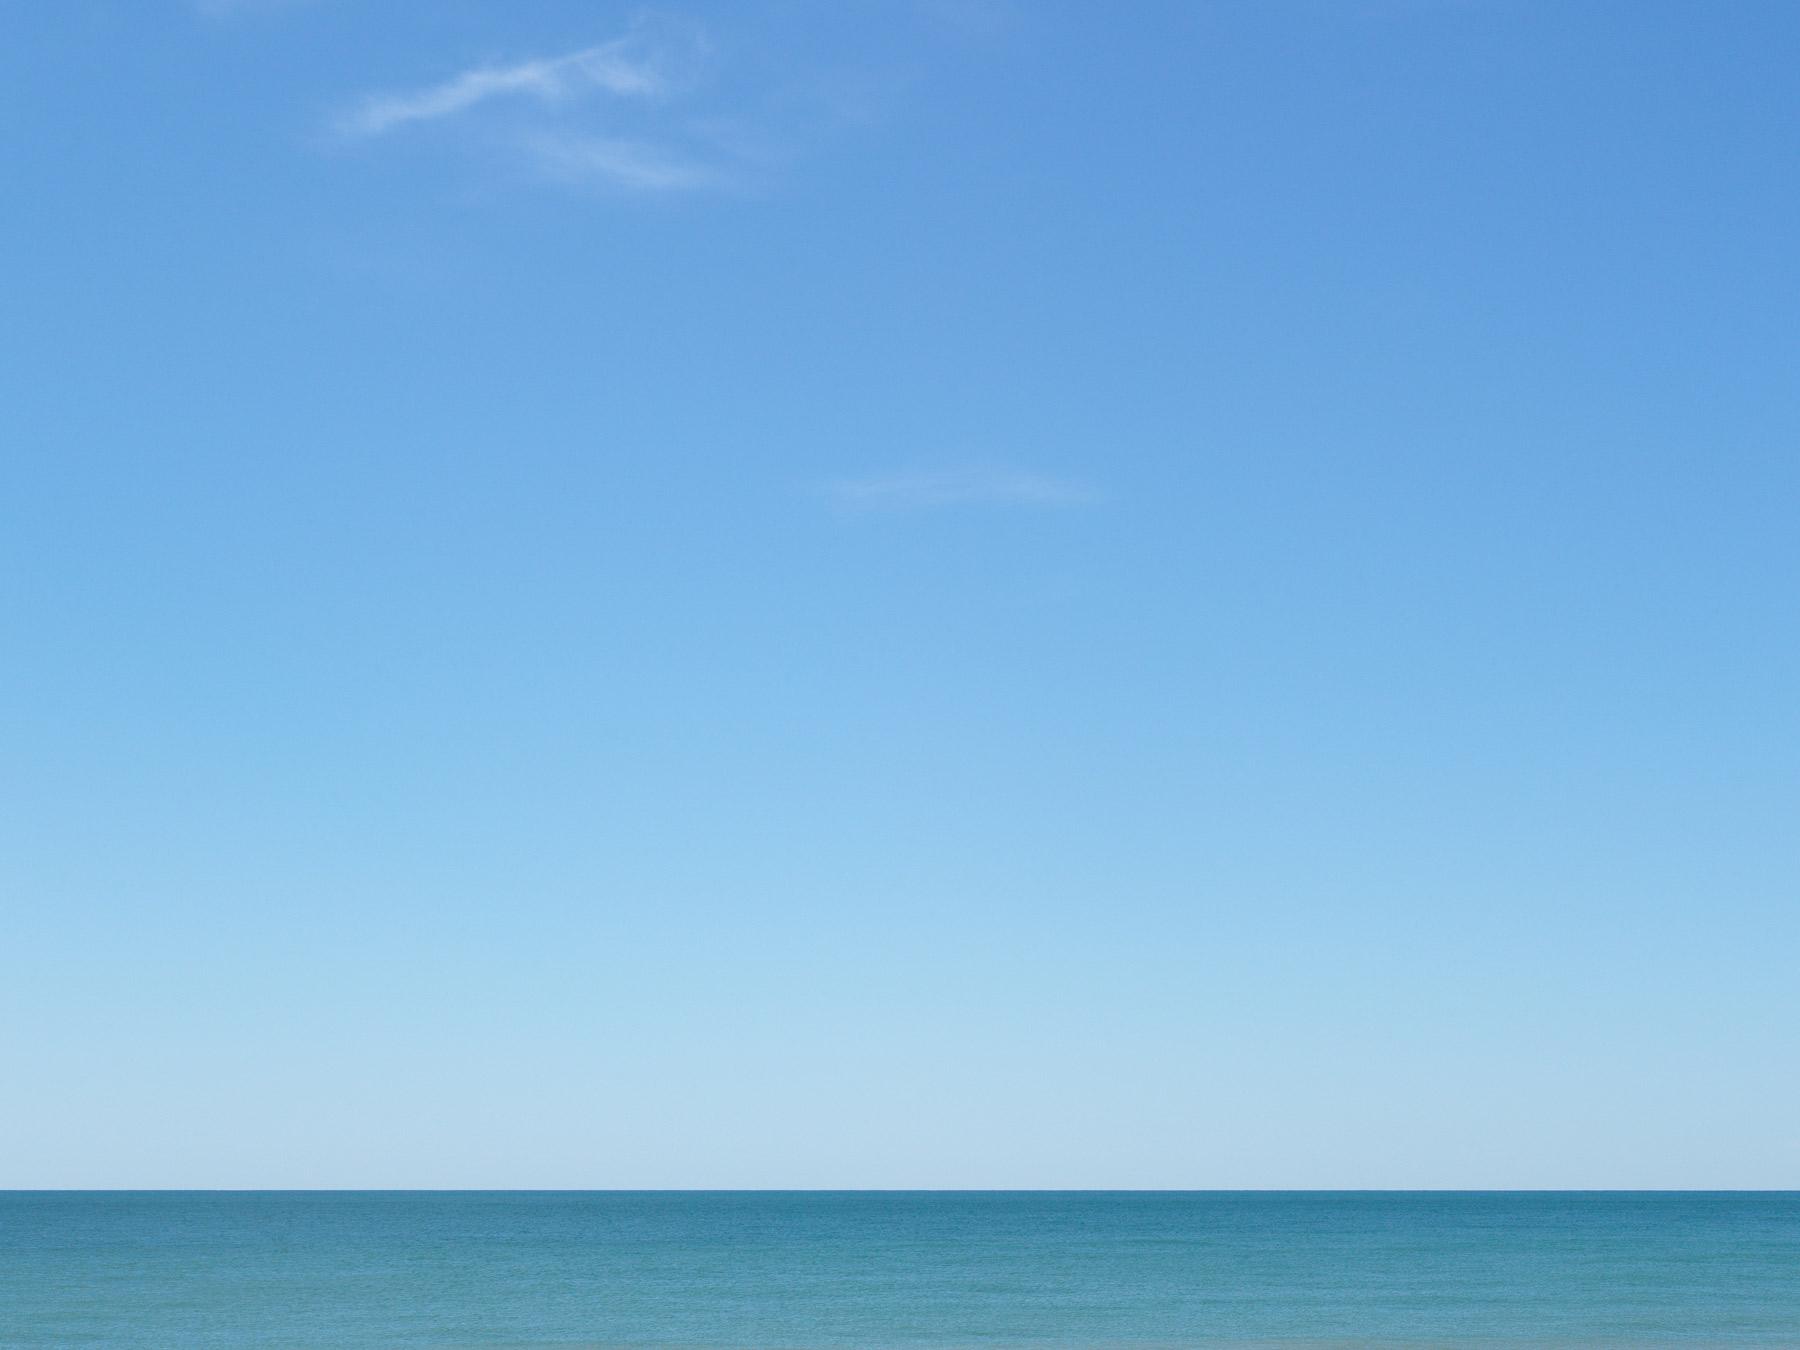 Azure-Seascape-A3978.jpg